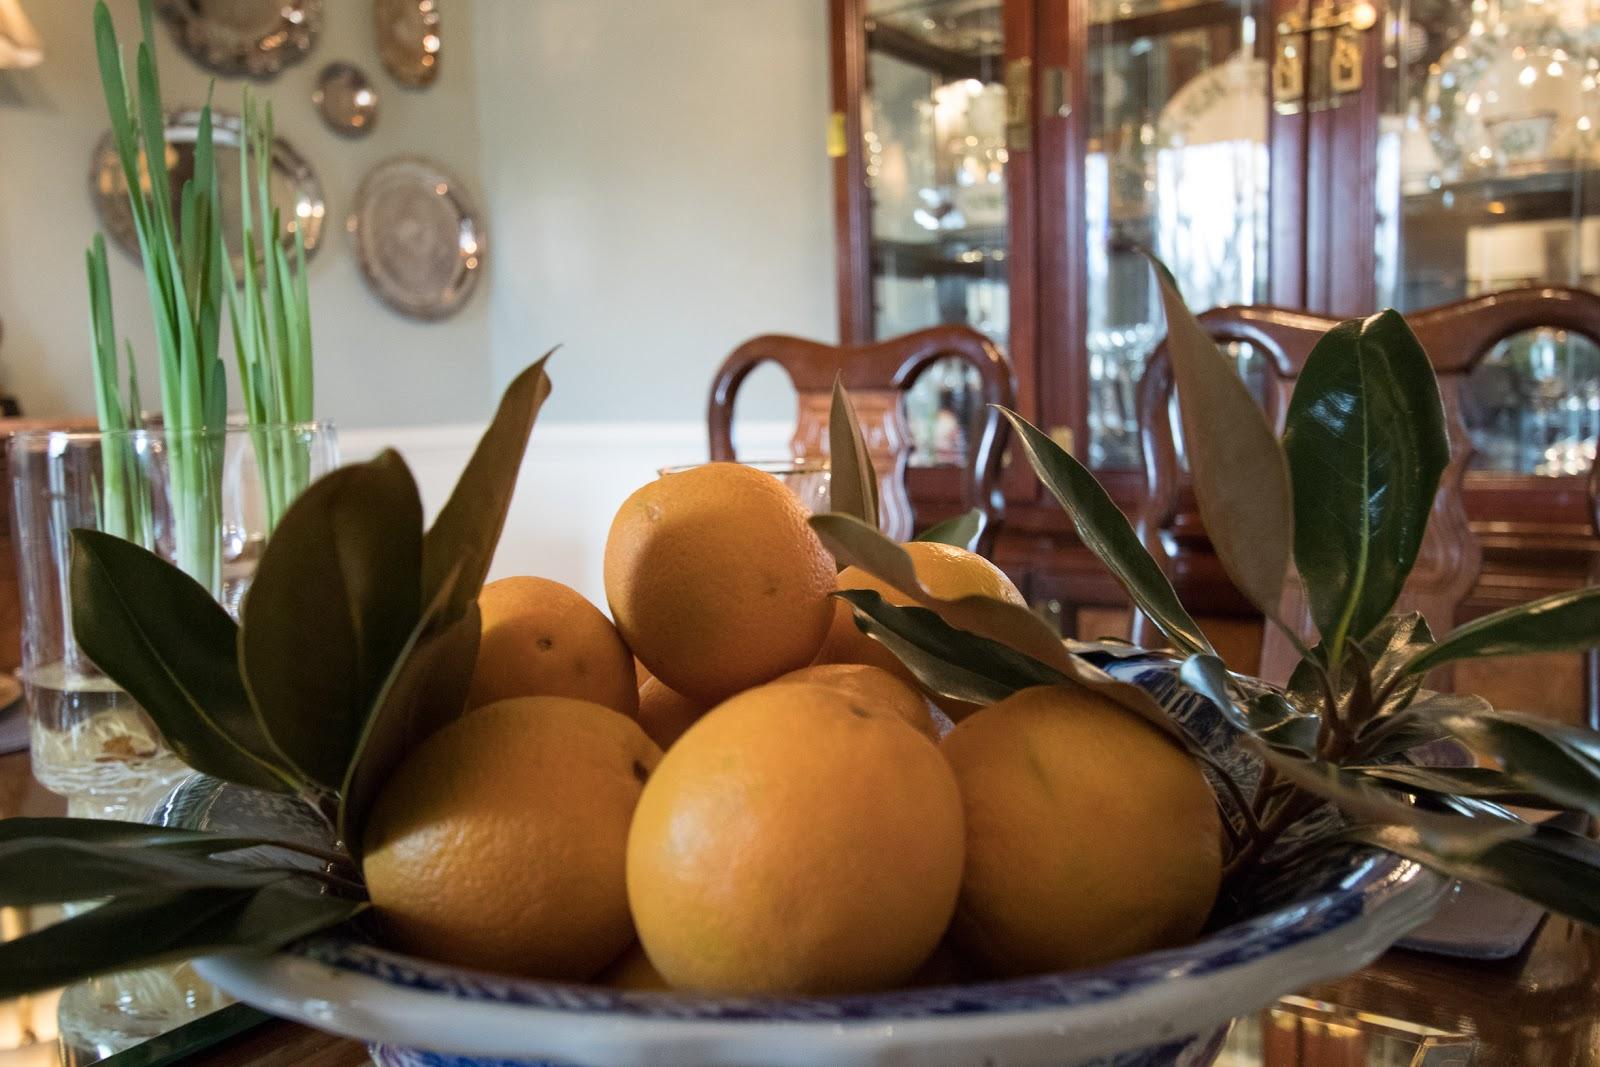 cozy winter centerpiece oranges leaves bright fun